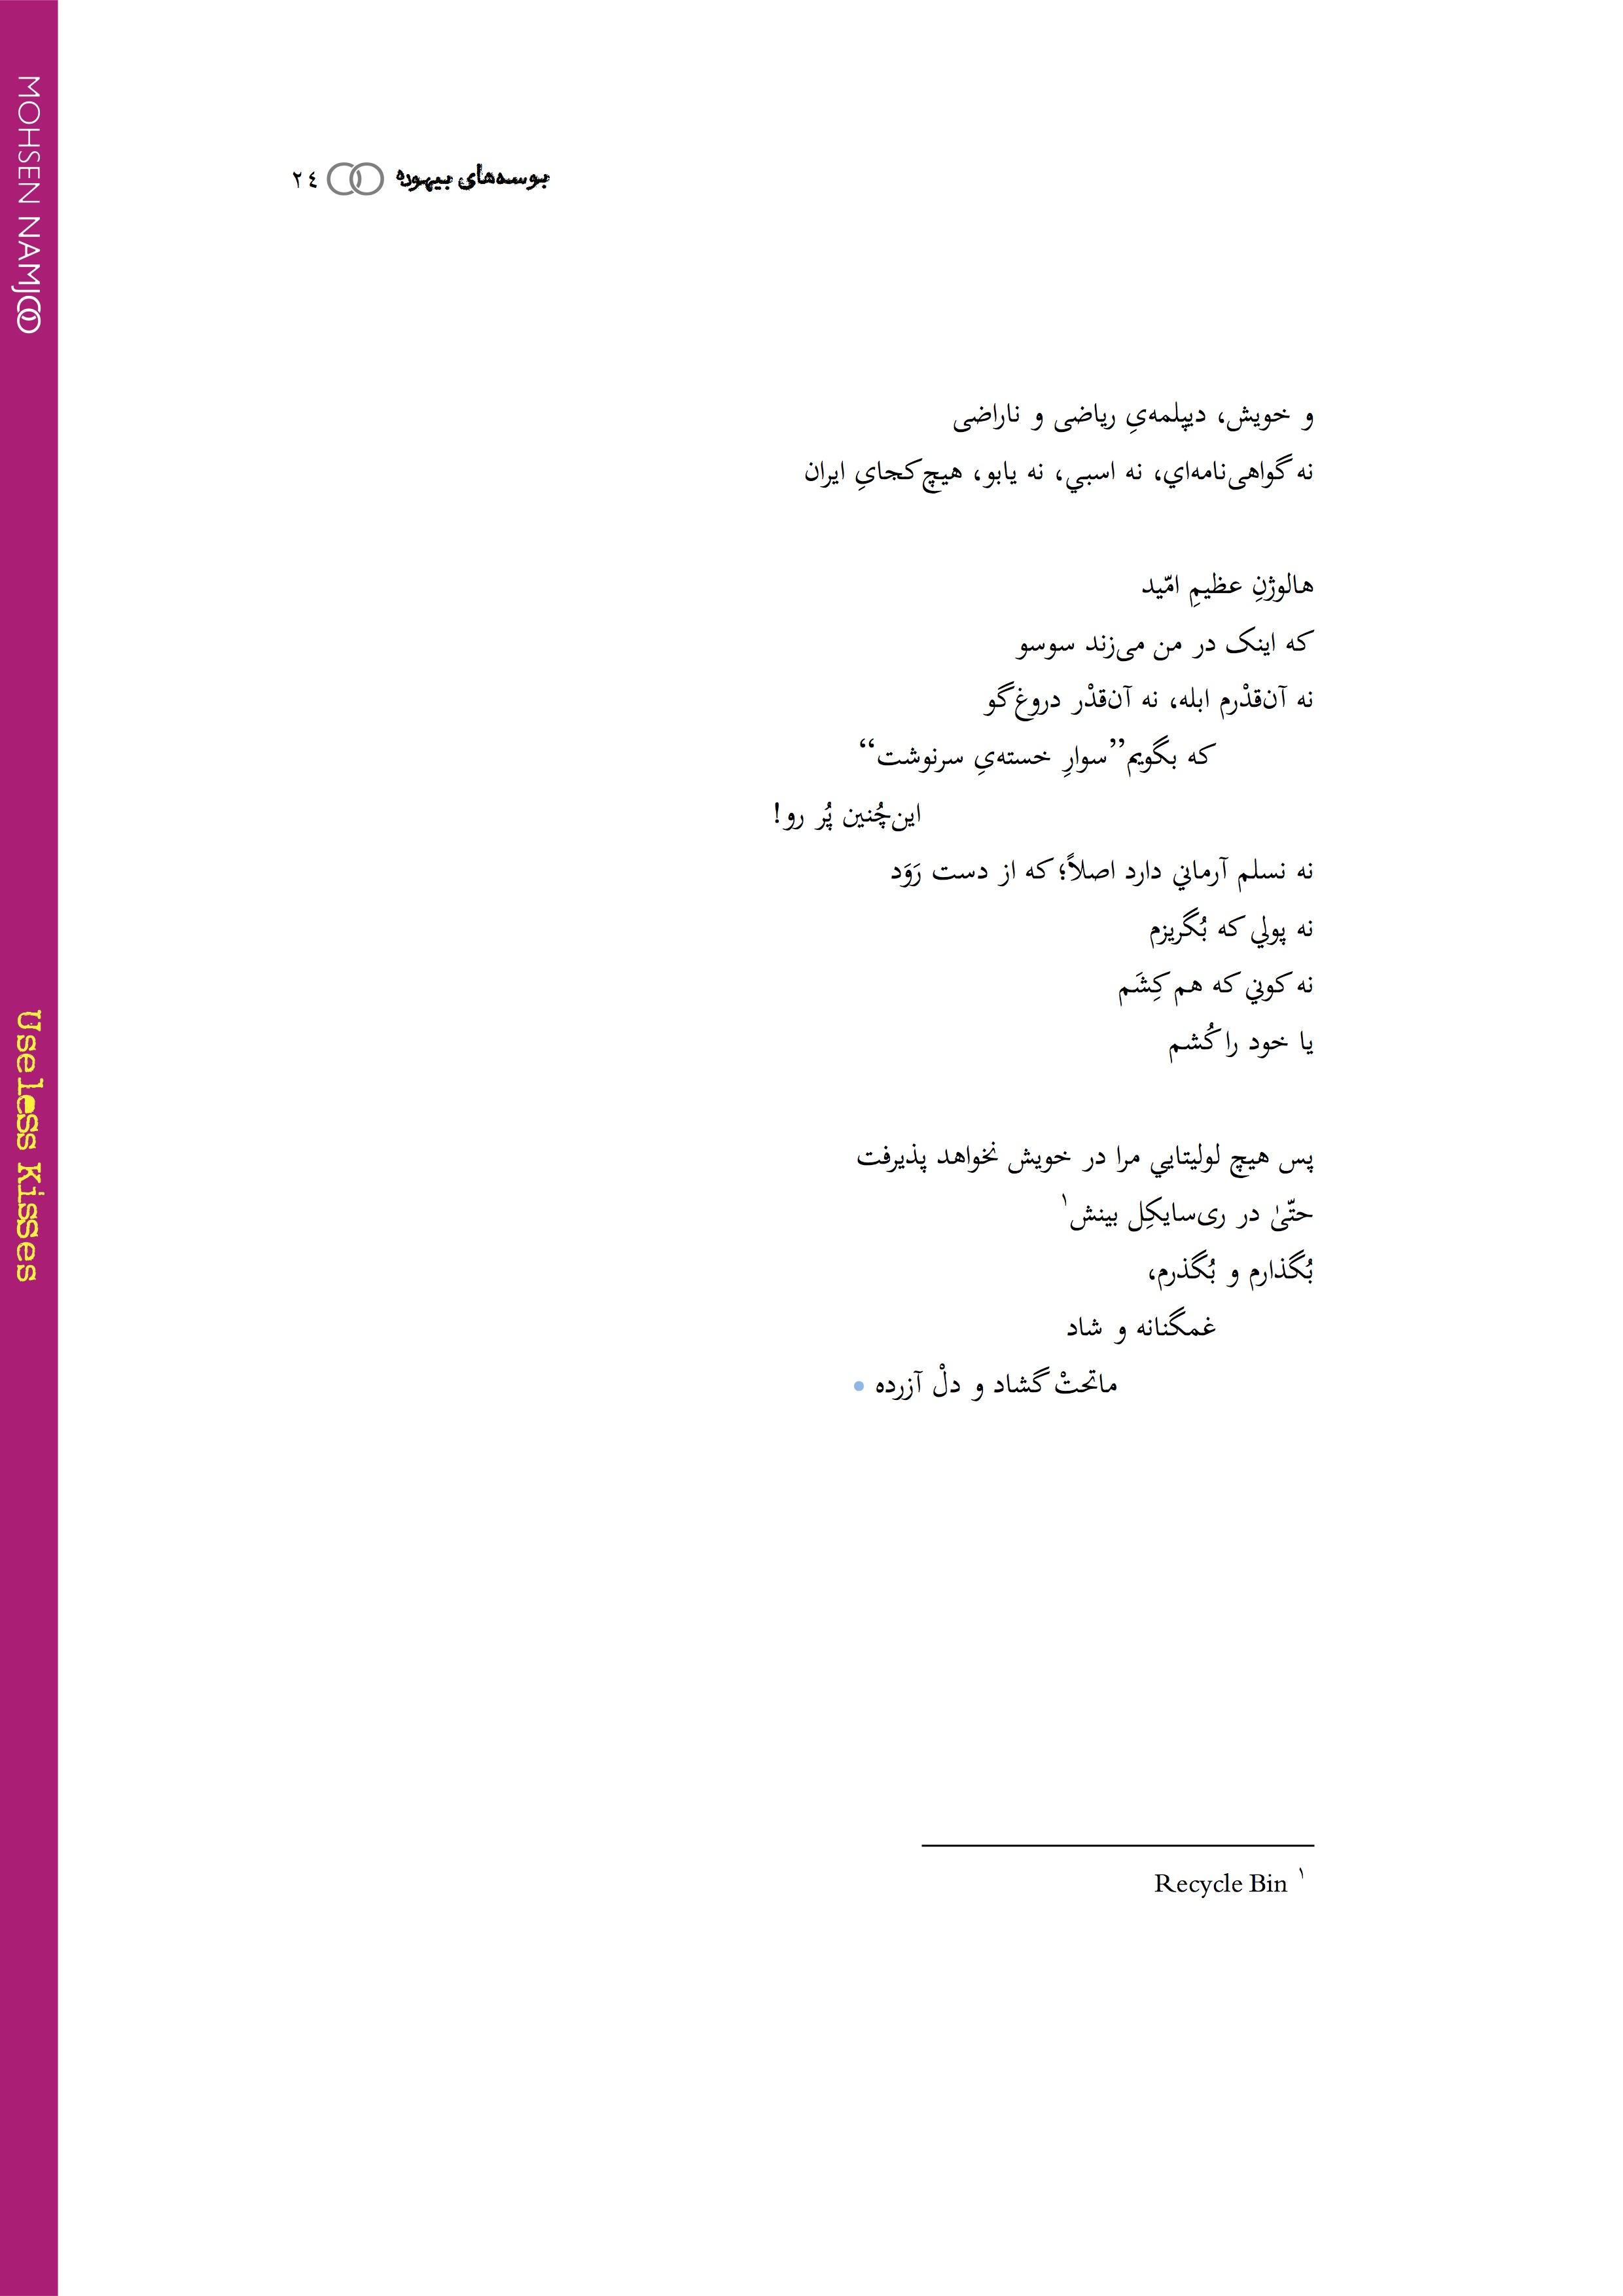 23Useless Kisses eBook (2nd Edition).jpg